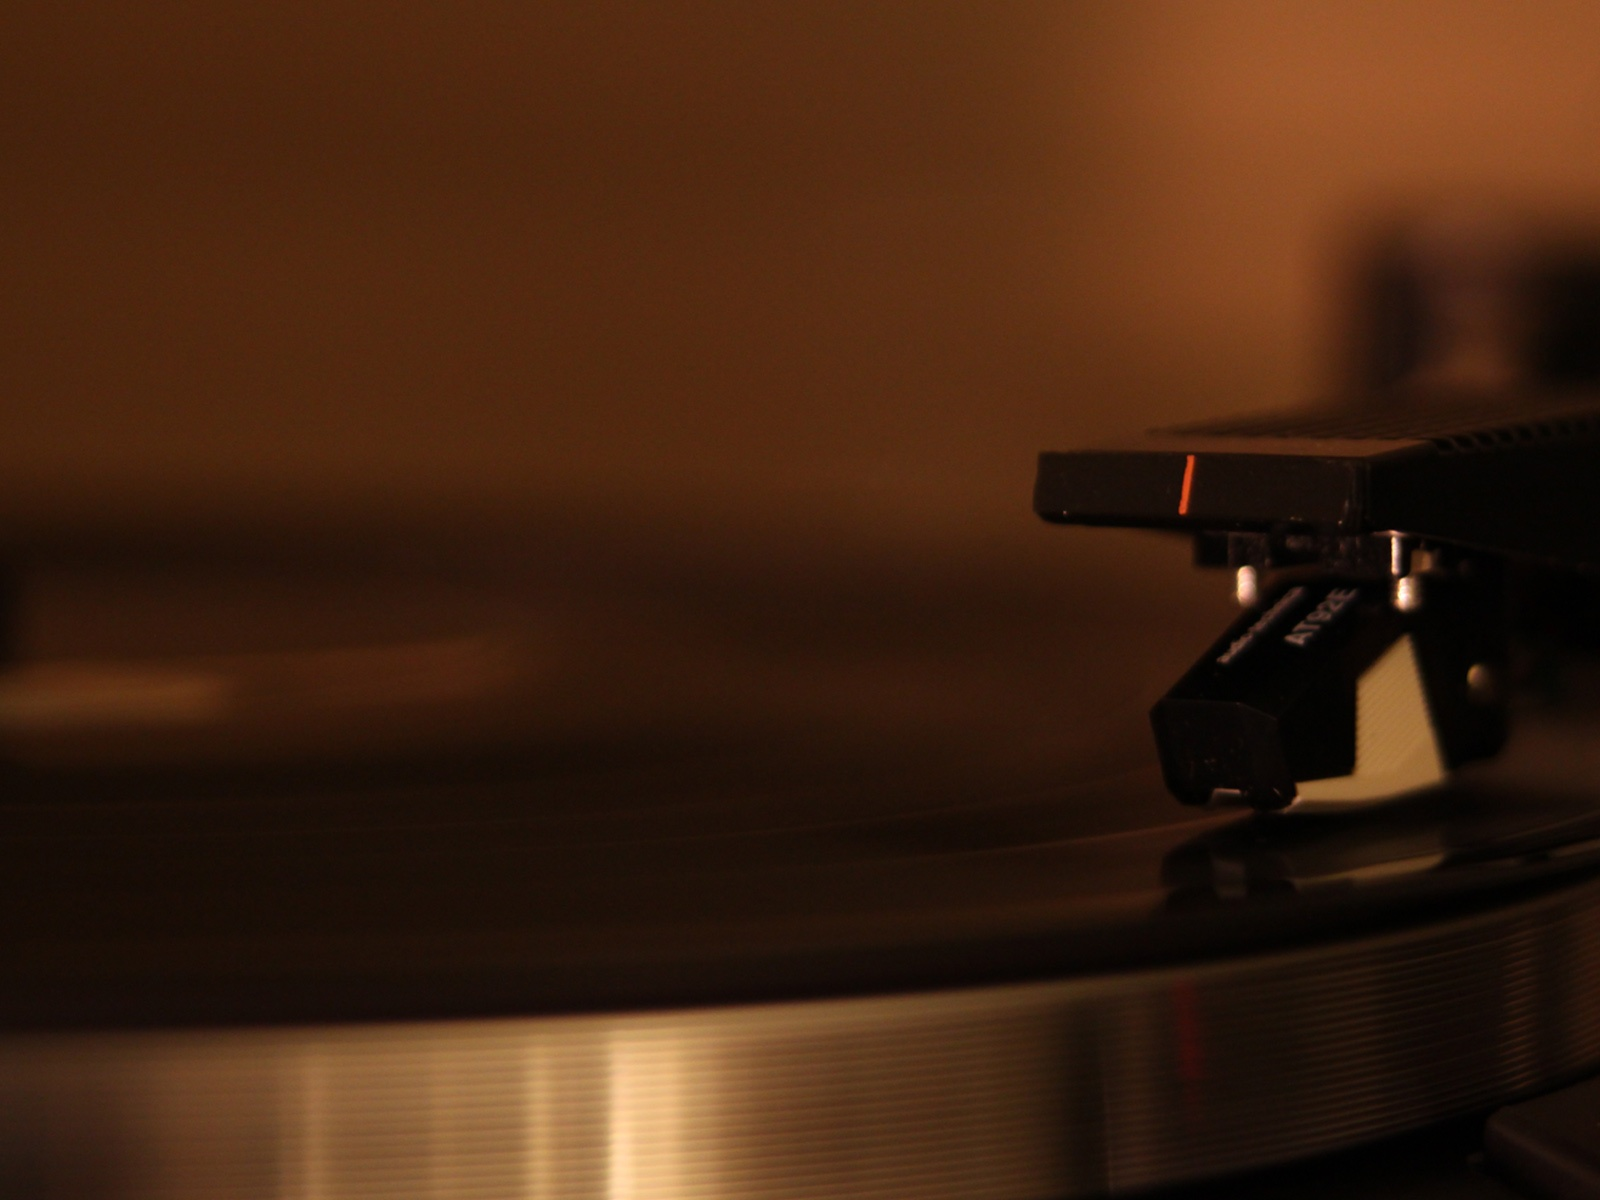 1600x1200 audio technica wallpaper music and dance wallpapers - Audio wallpaper ...